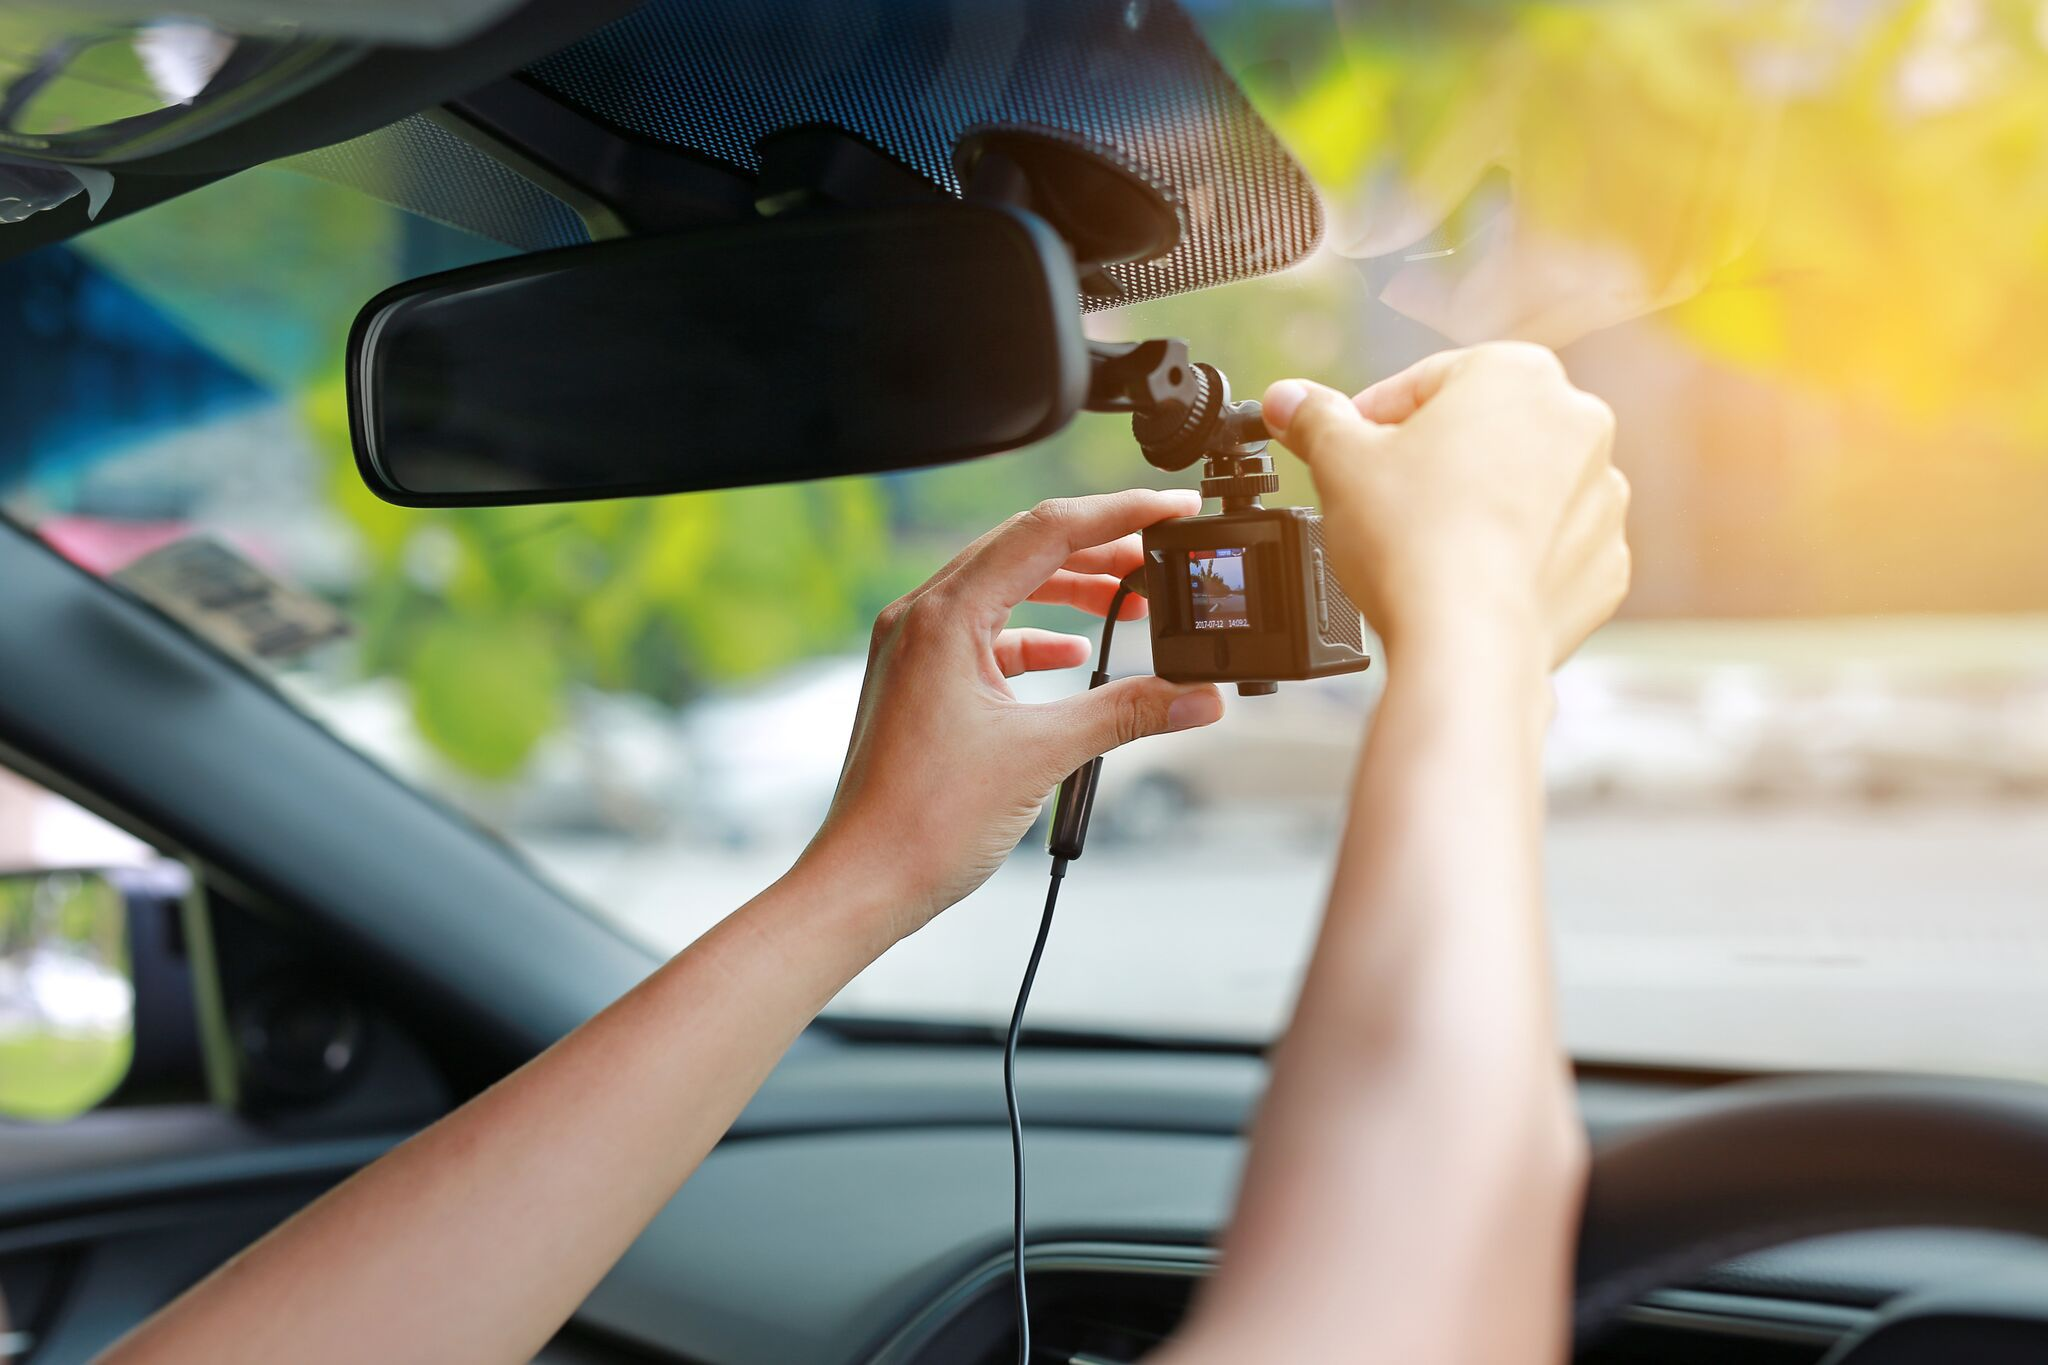 Adjusting a dash cam on your car windscreen